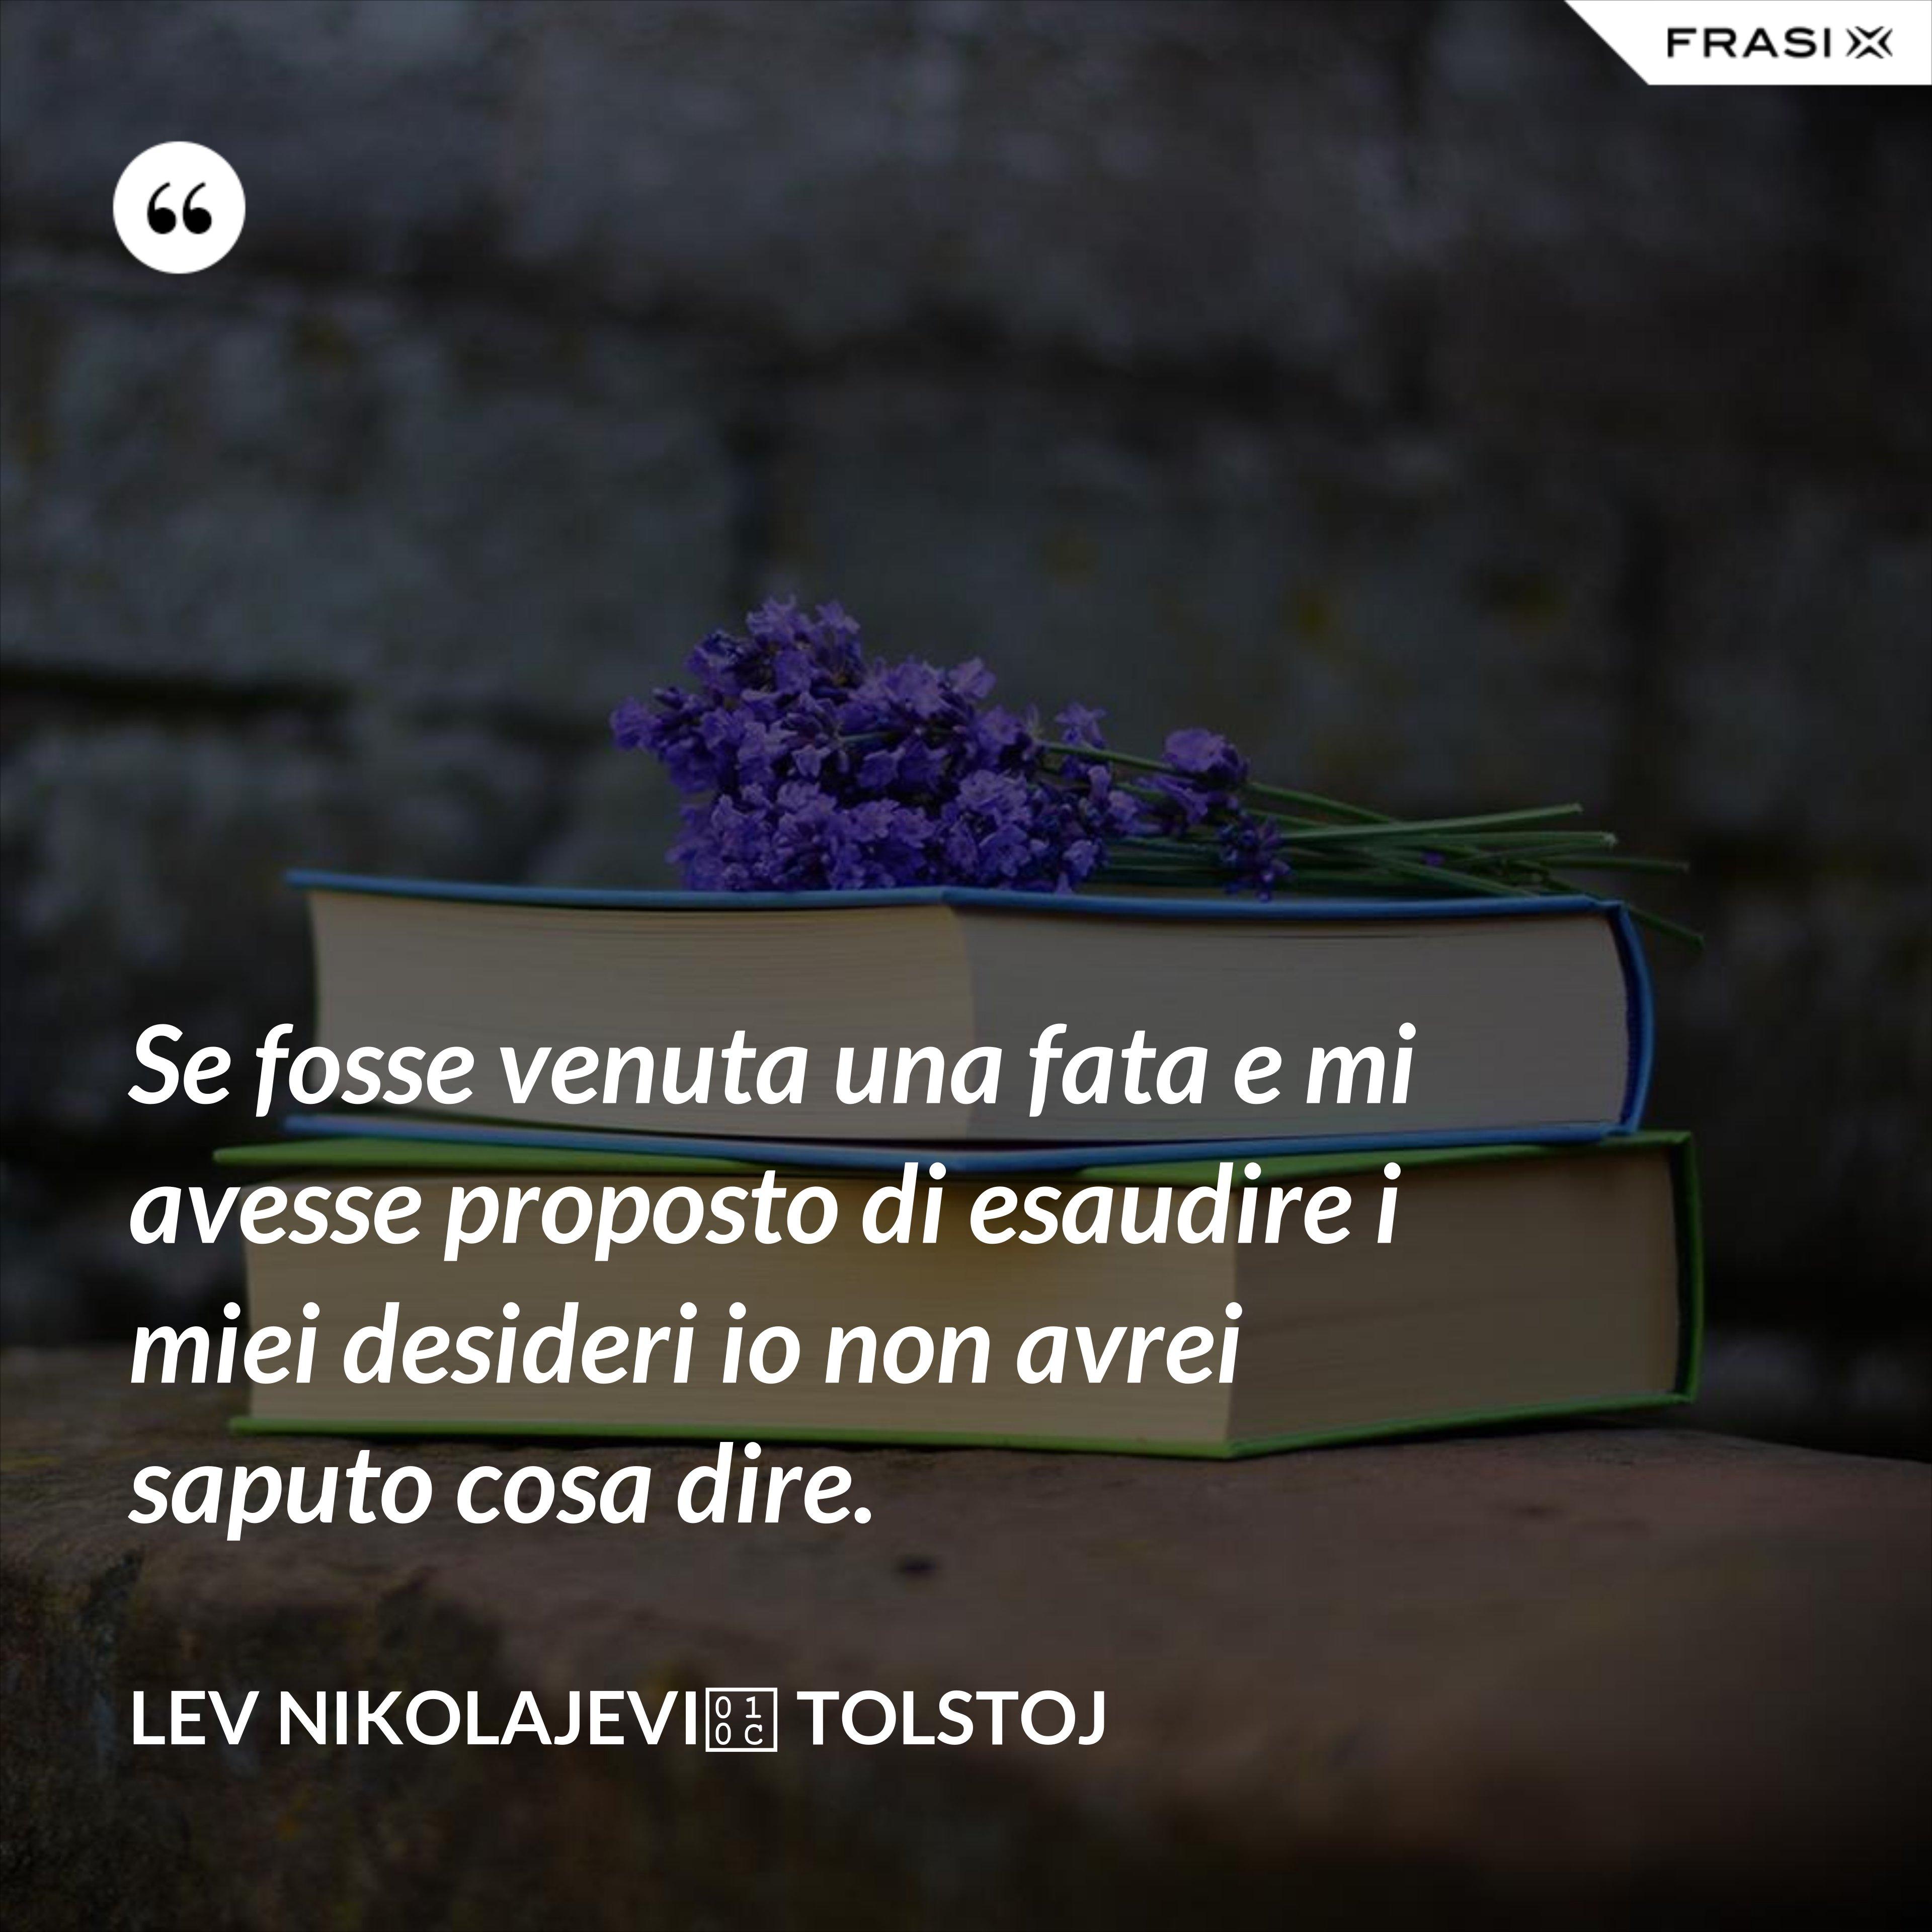 Se fosse venuta una fata e mi avesse proposto di esaudire i miei desideri io non avrei saputo cosa dire. - Lev Nikolajevič Tolstoj